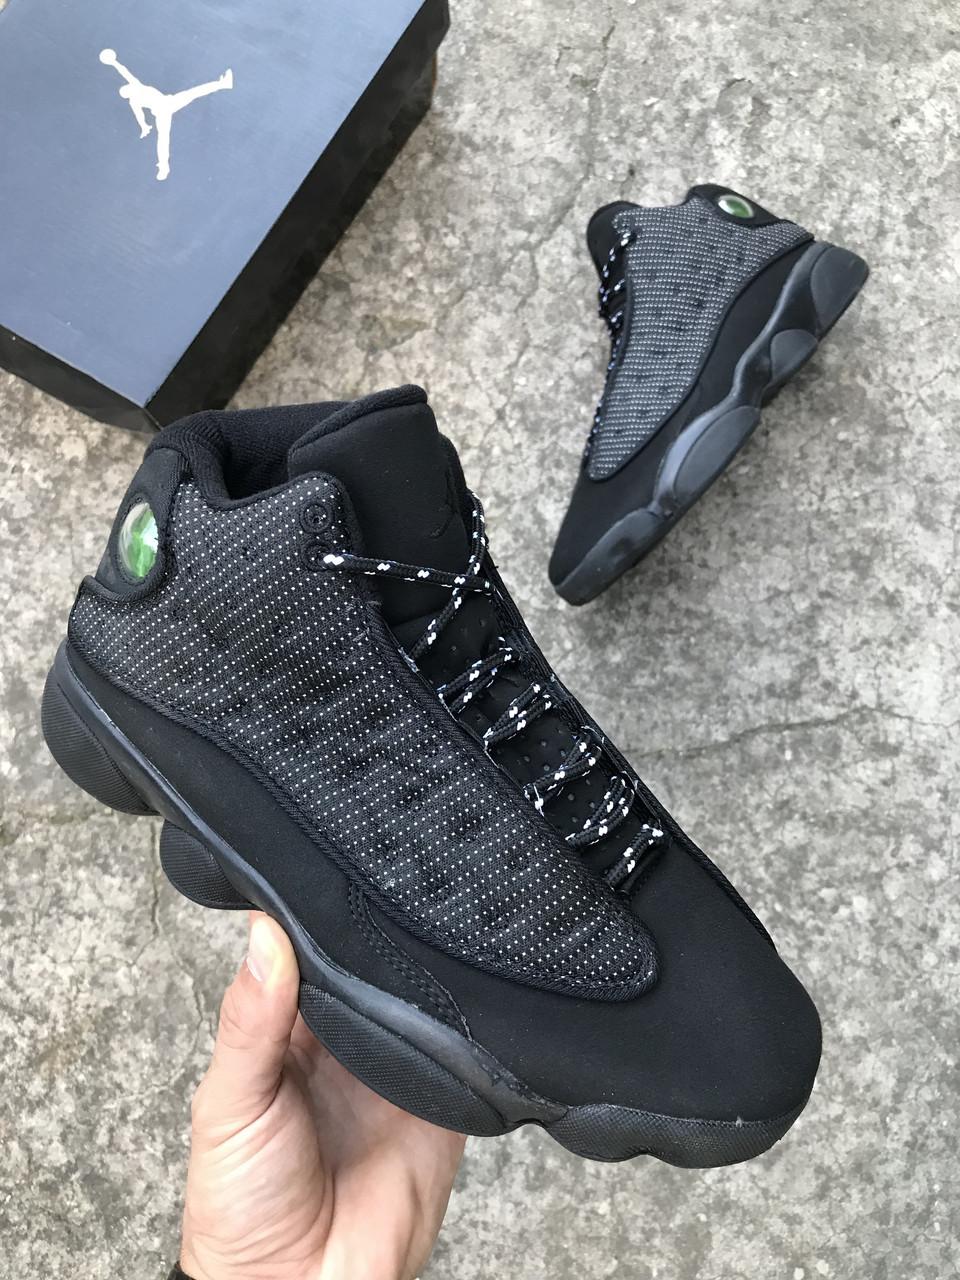 d2b2460d Мужские кроссовки Nike Air Jordan 13 ,Реплика - TopCross в Львове